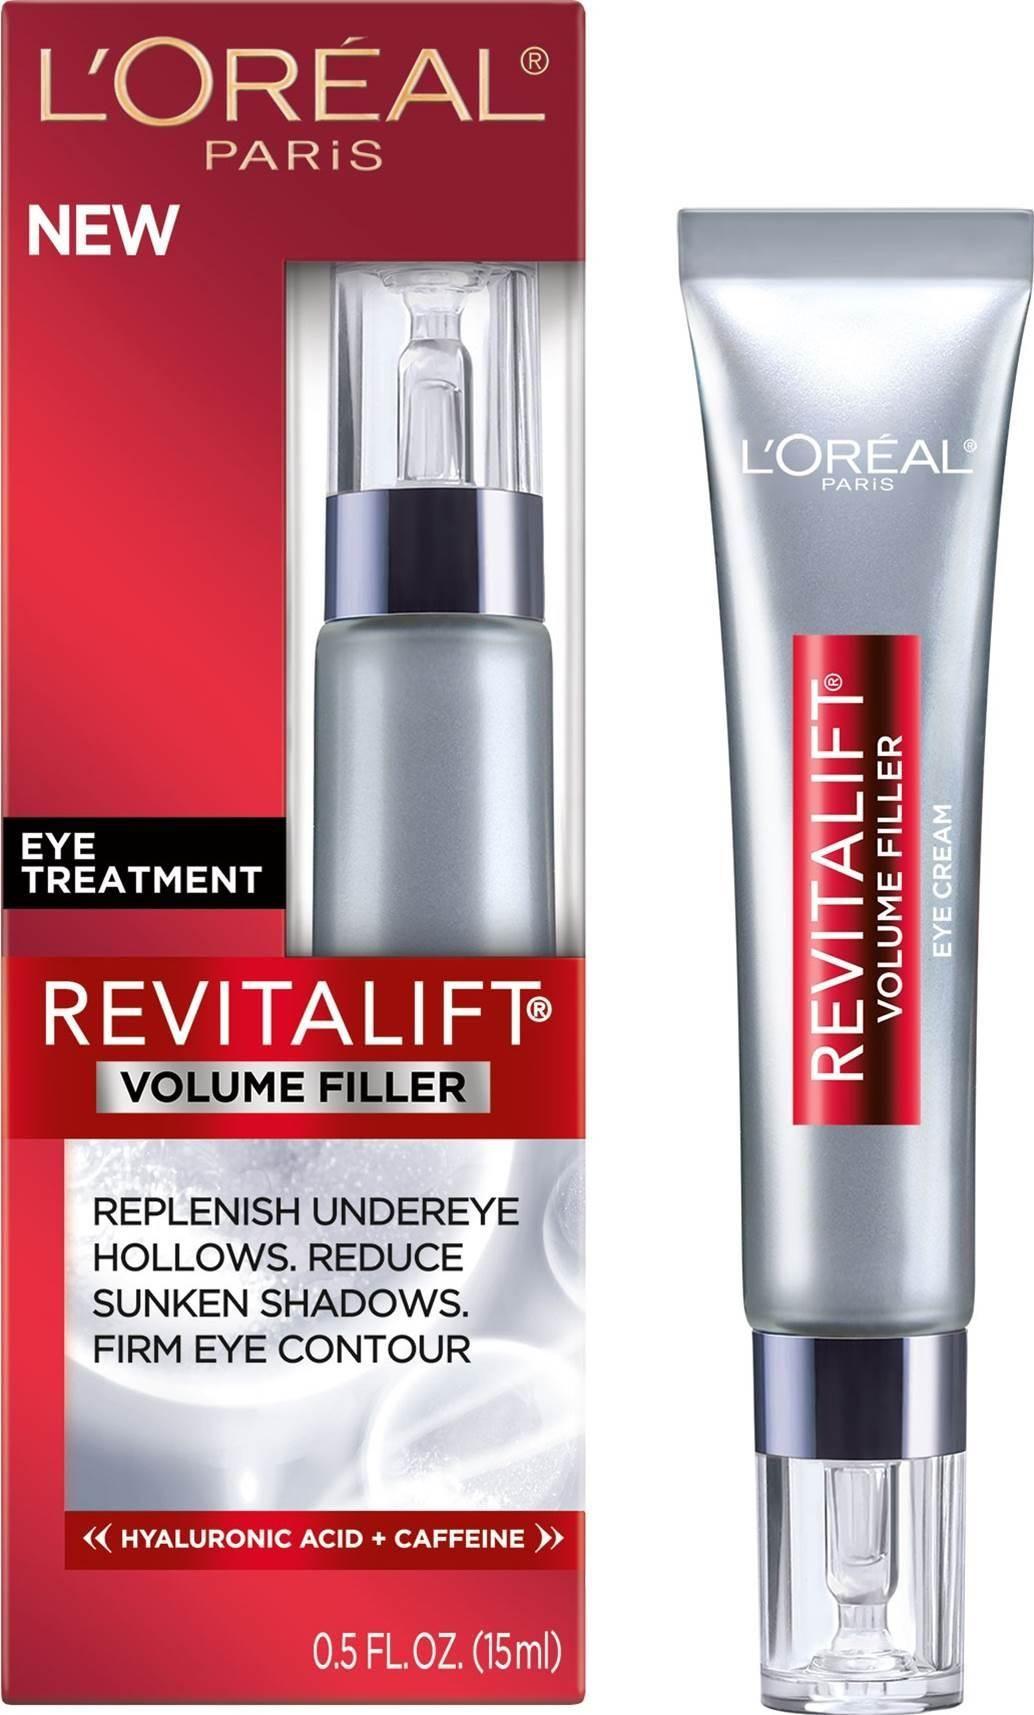 L'Oréal Paris Double Extend Mascara Beauty tube, Mascara